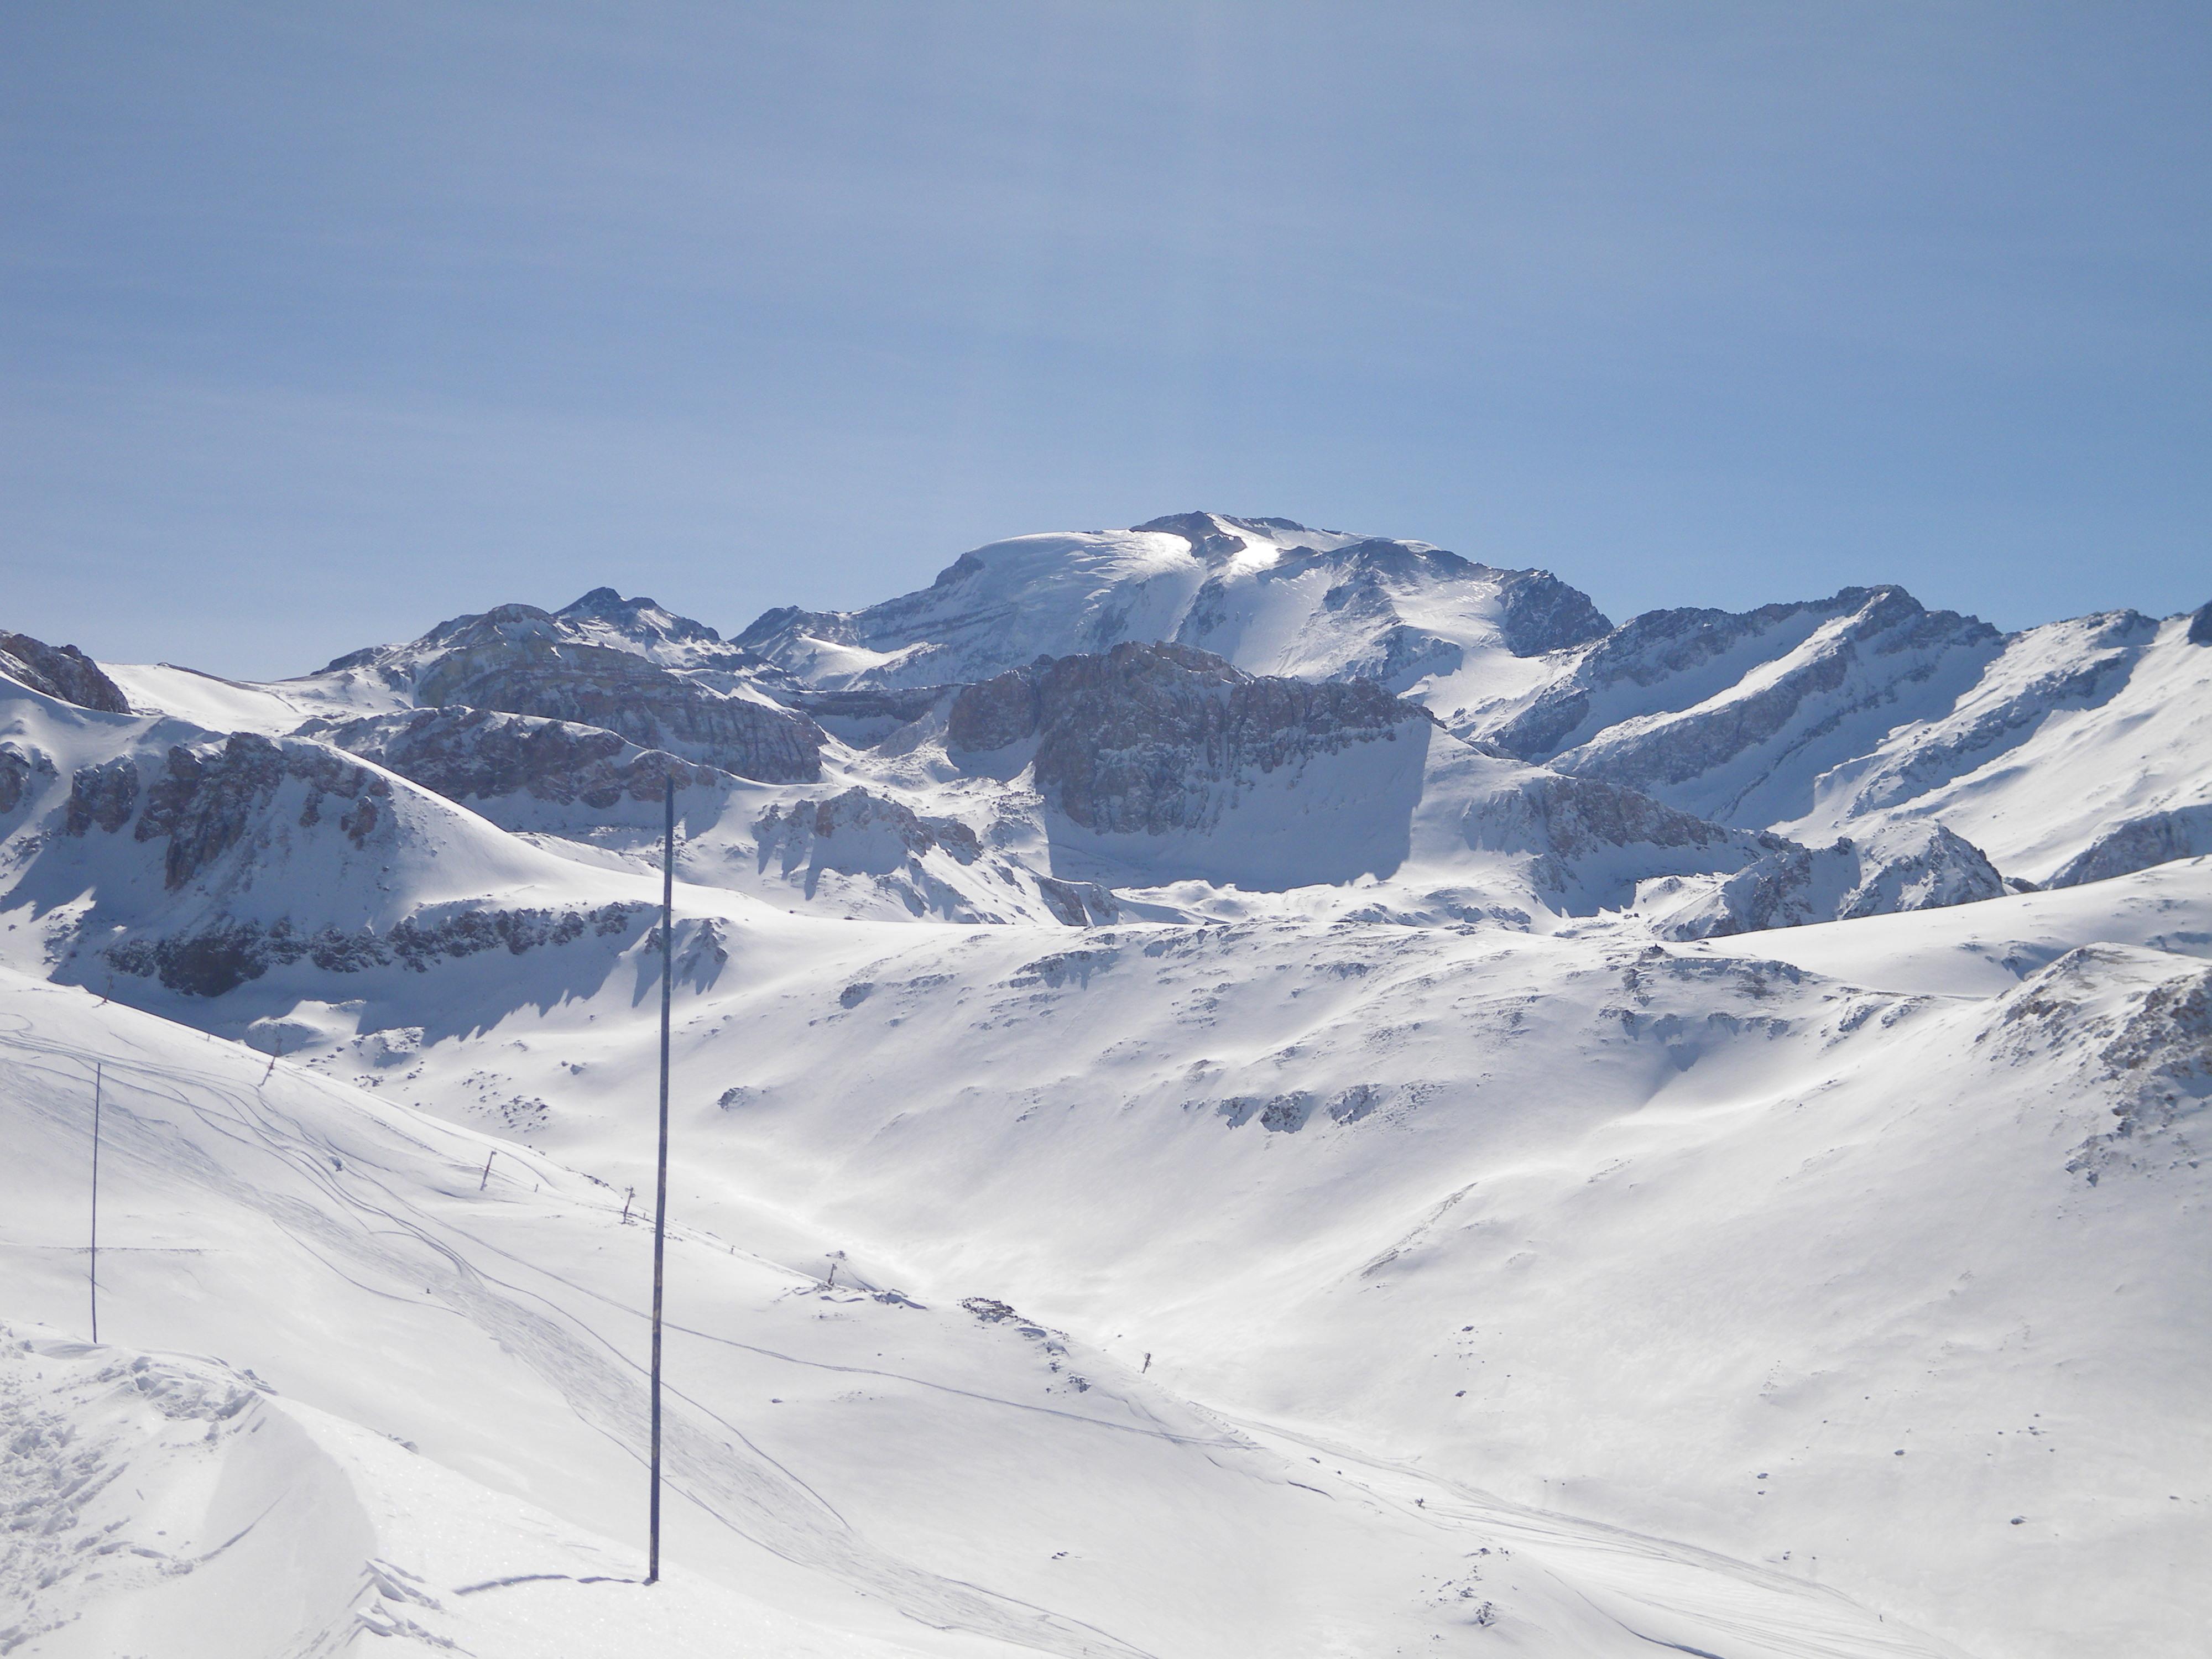 Valle Nevado - Tres puntos and Plomo